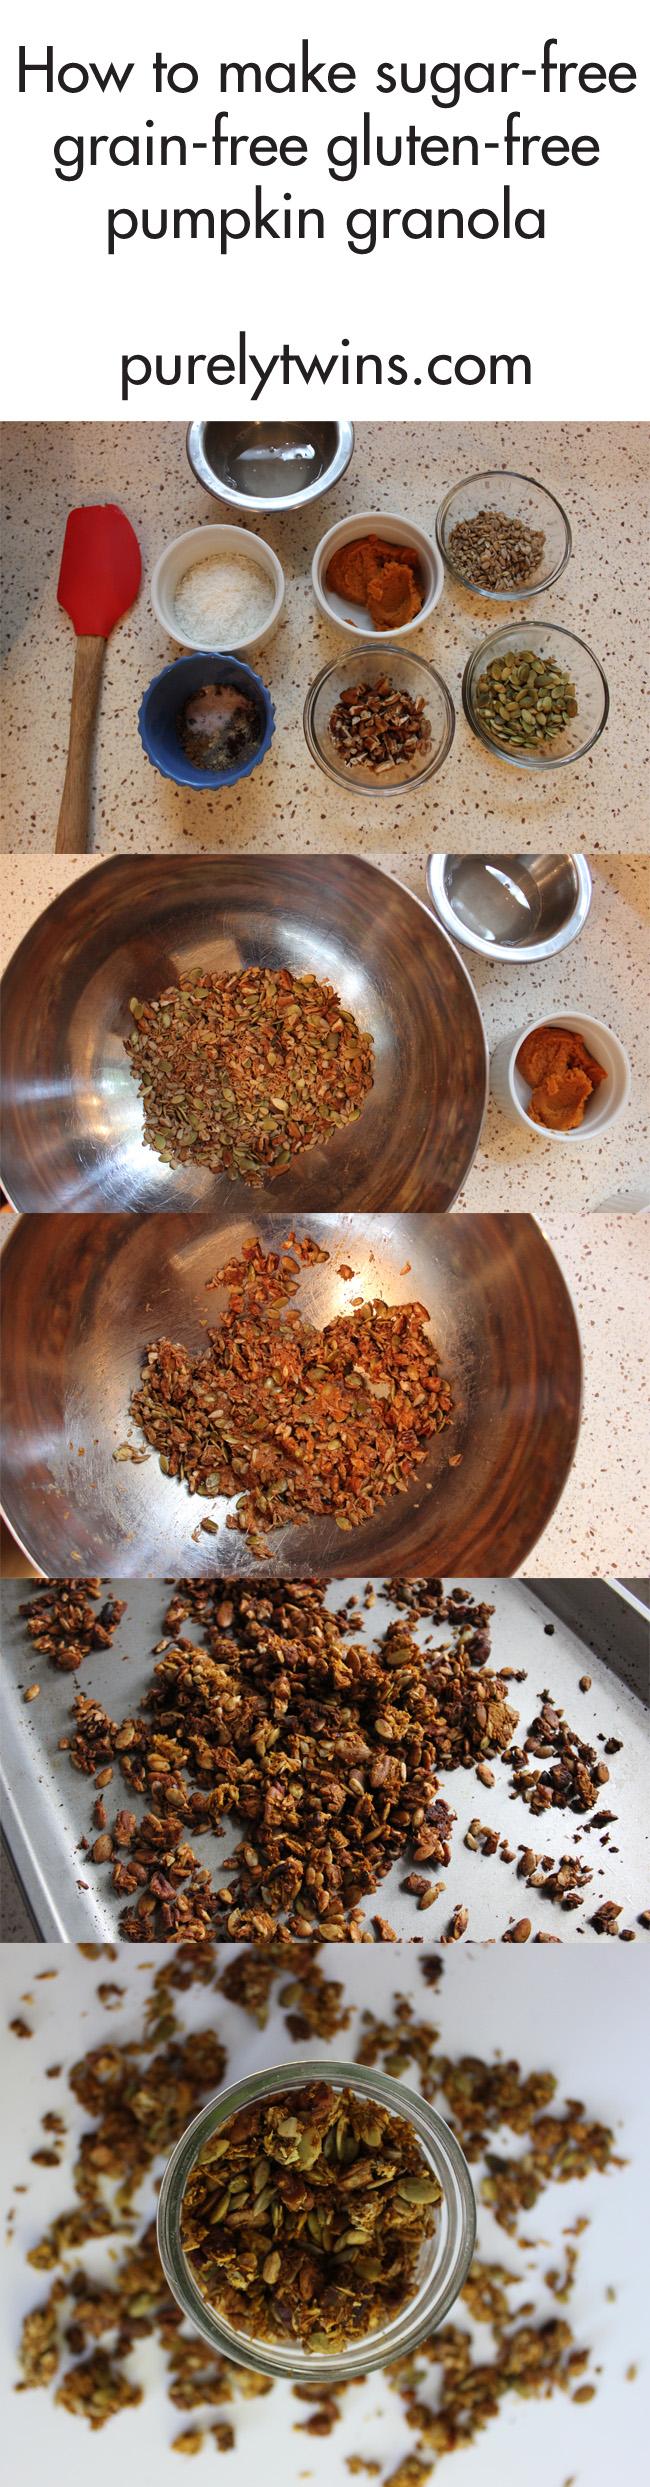 how-to-make-sugar-free-grain-free-pumpkin-granola-purelytwins